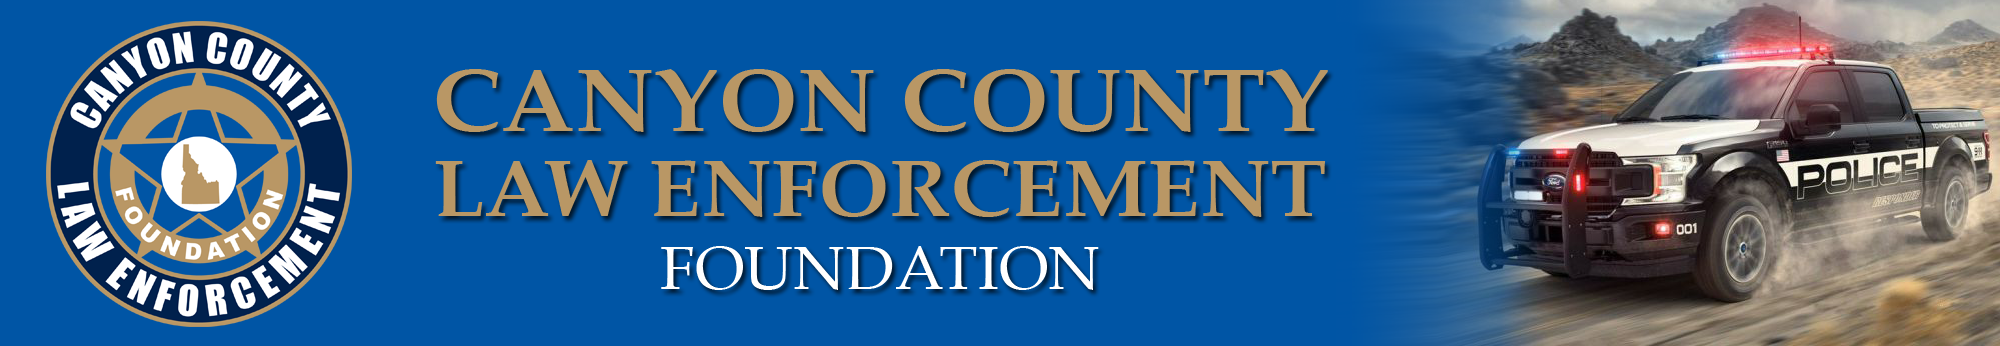 Canyon County Sheriff's Community Foundation